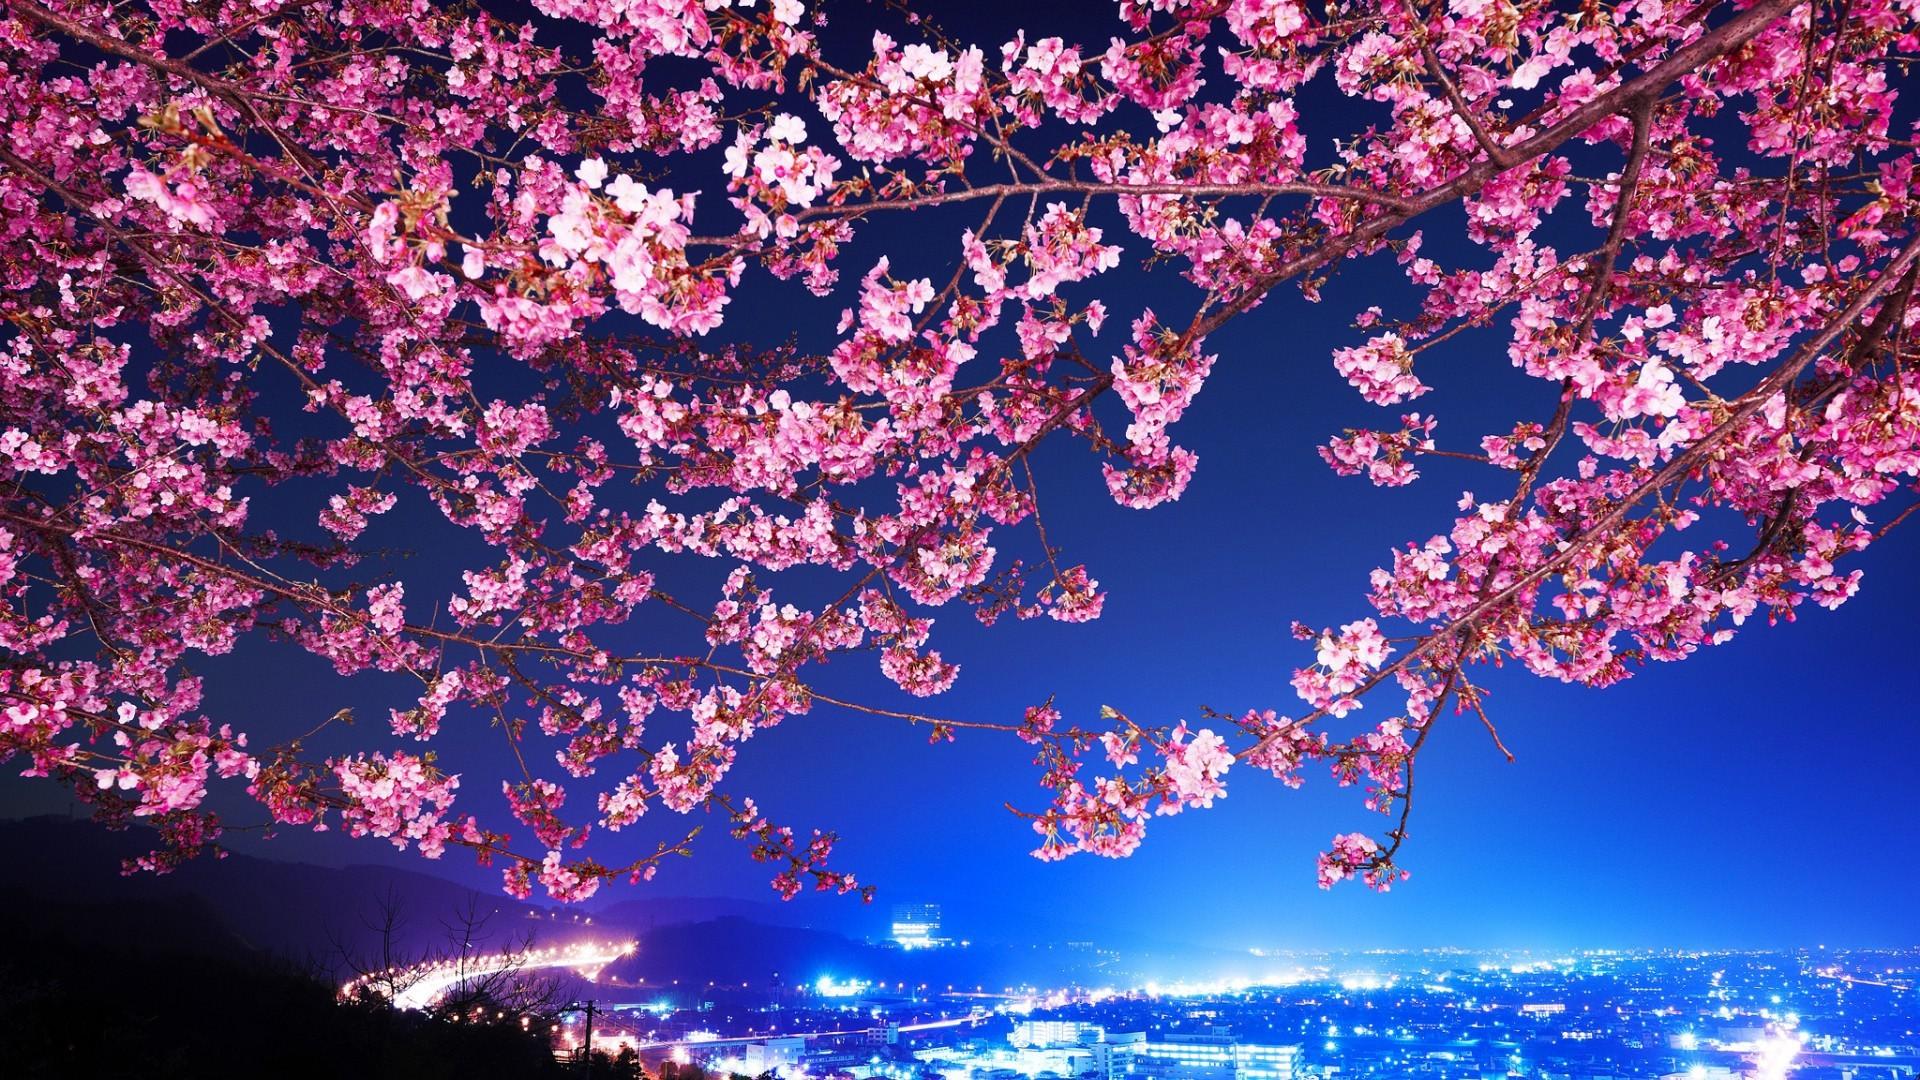 Wallpaper Trees Flowers City Cityscape Branch Blue Cherry Blossom Tokyo Night View Tree Flower Plant 1920x1080 Kotan 248225 Hd Wallpapers Wallhere